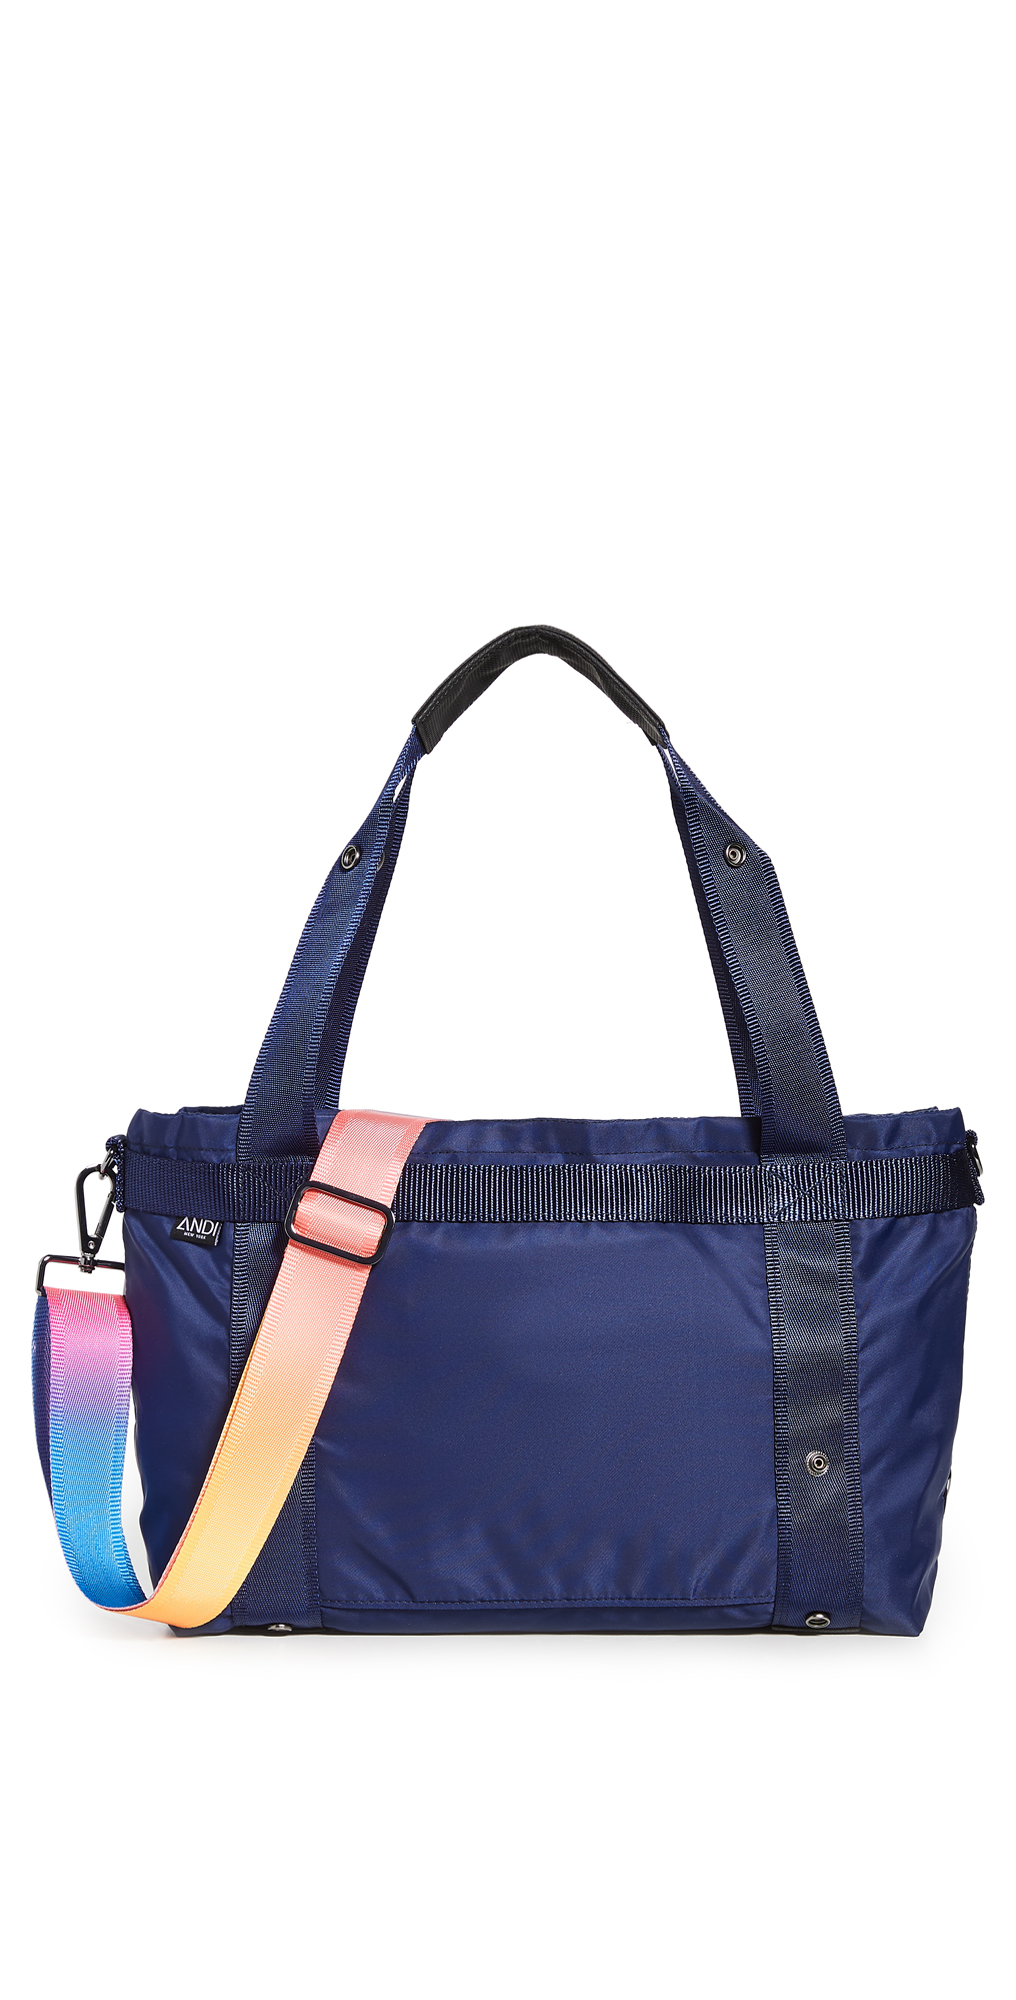 ANDI The ANDI Small Bag